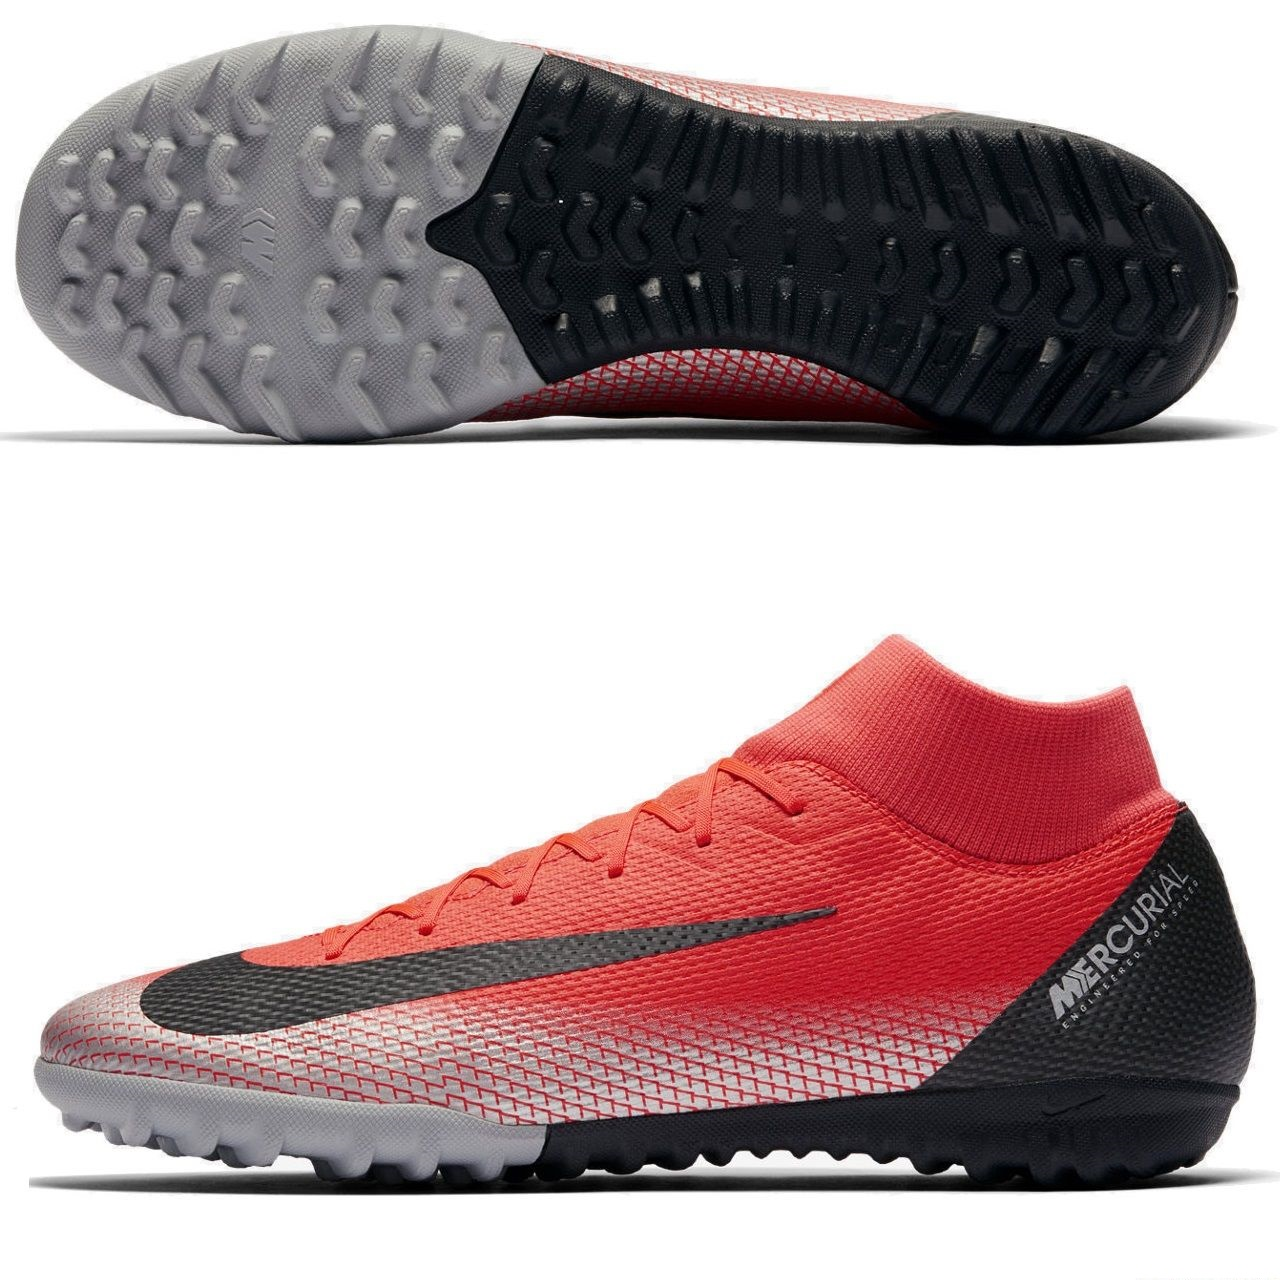 6e2f8007 aj3568-600. Сороконожки Nike Mercurial SuperflyX 6 Academy TF ...